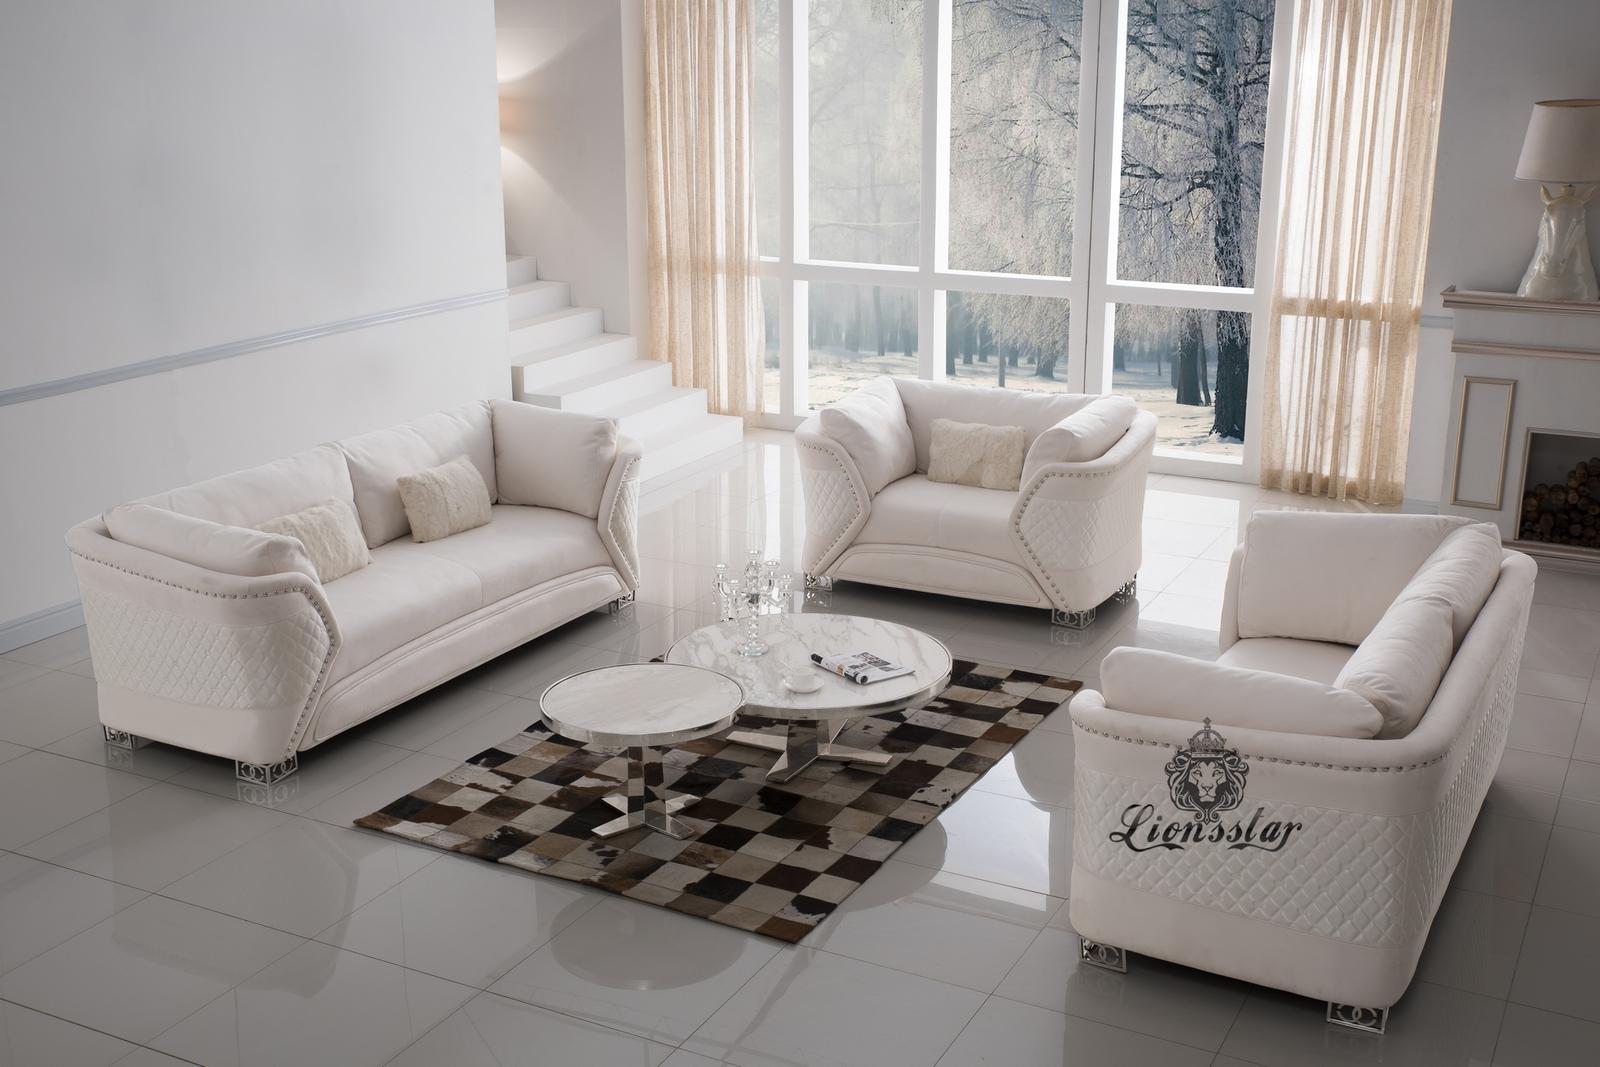 Luxuriöse Designersofa 3er Set